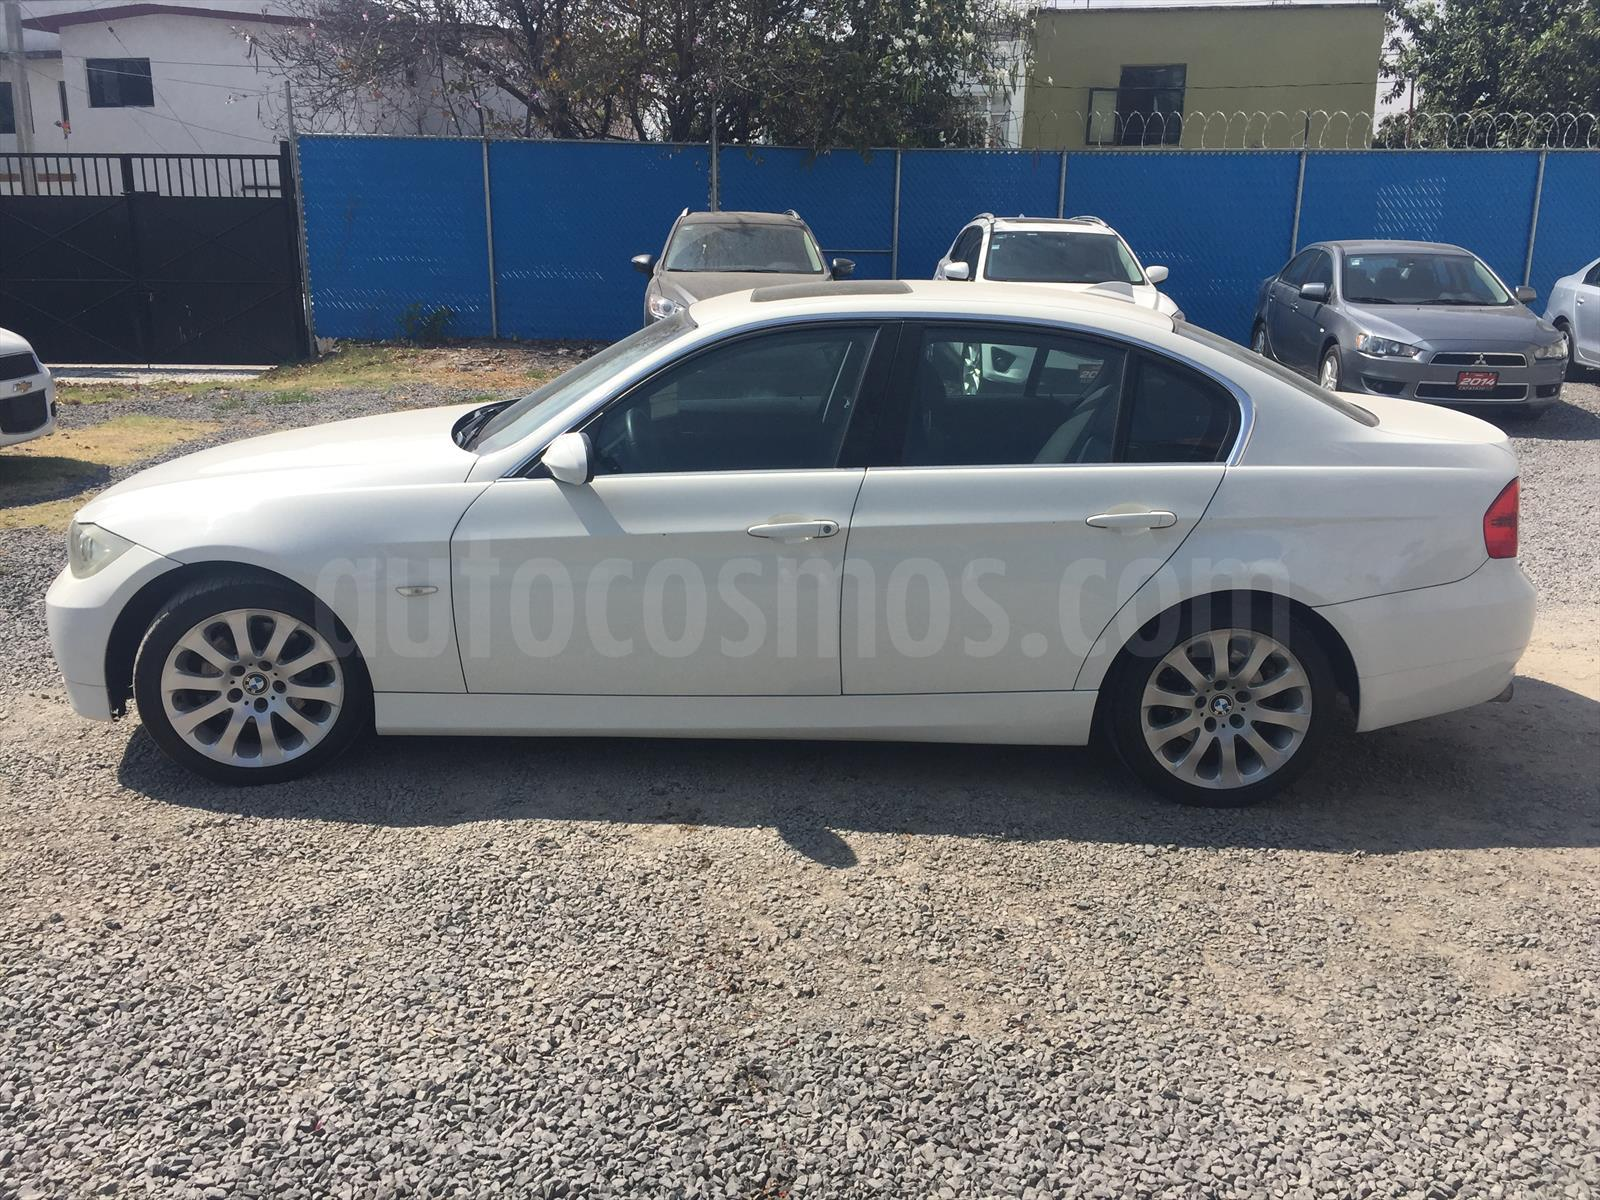 mazda 2 queretaro with 17555289 on 20141108 moreover MLM 555847408 Leds Mazda 6 Luz De Dia Drl Nuevo Modelos  JM also 162299 together with Leon moreover 17558281.